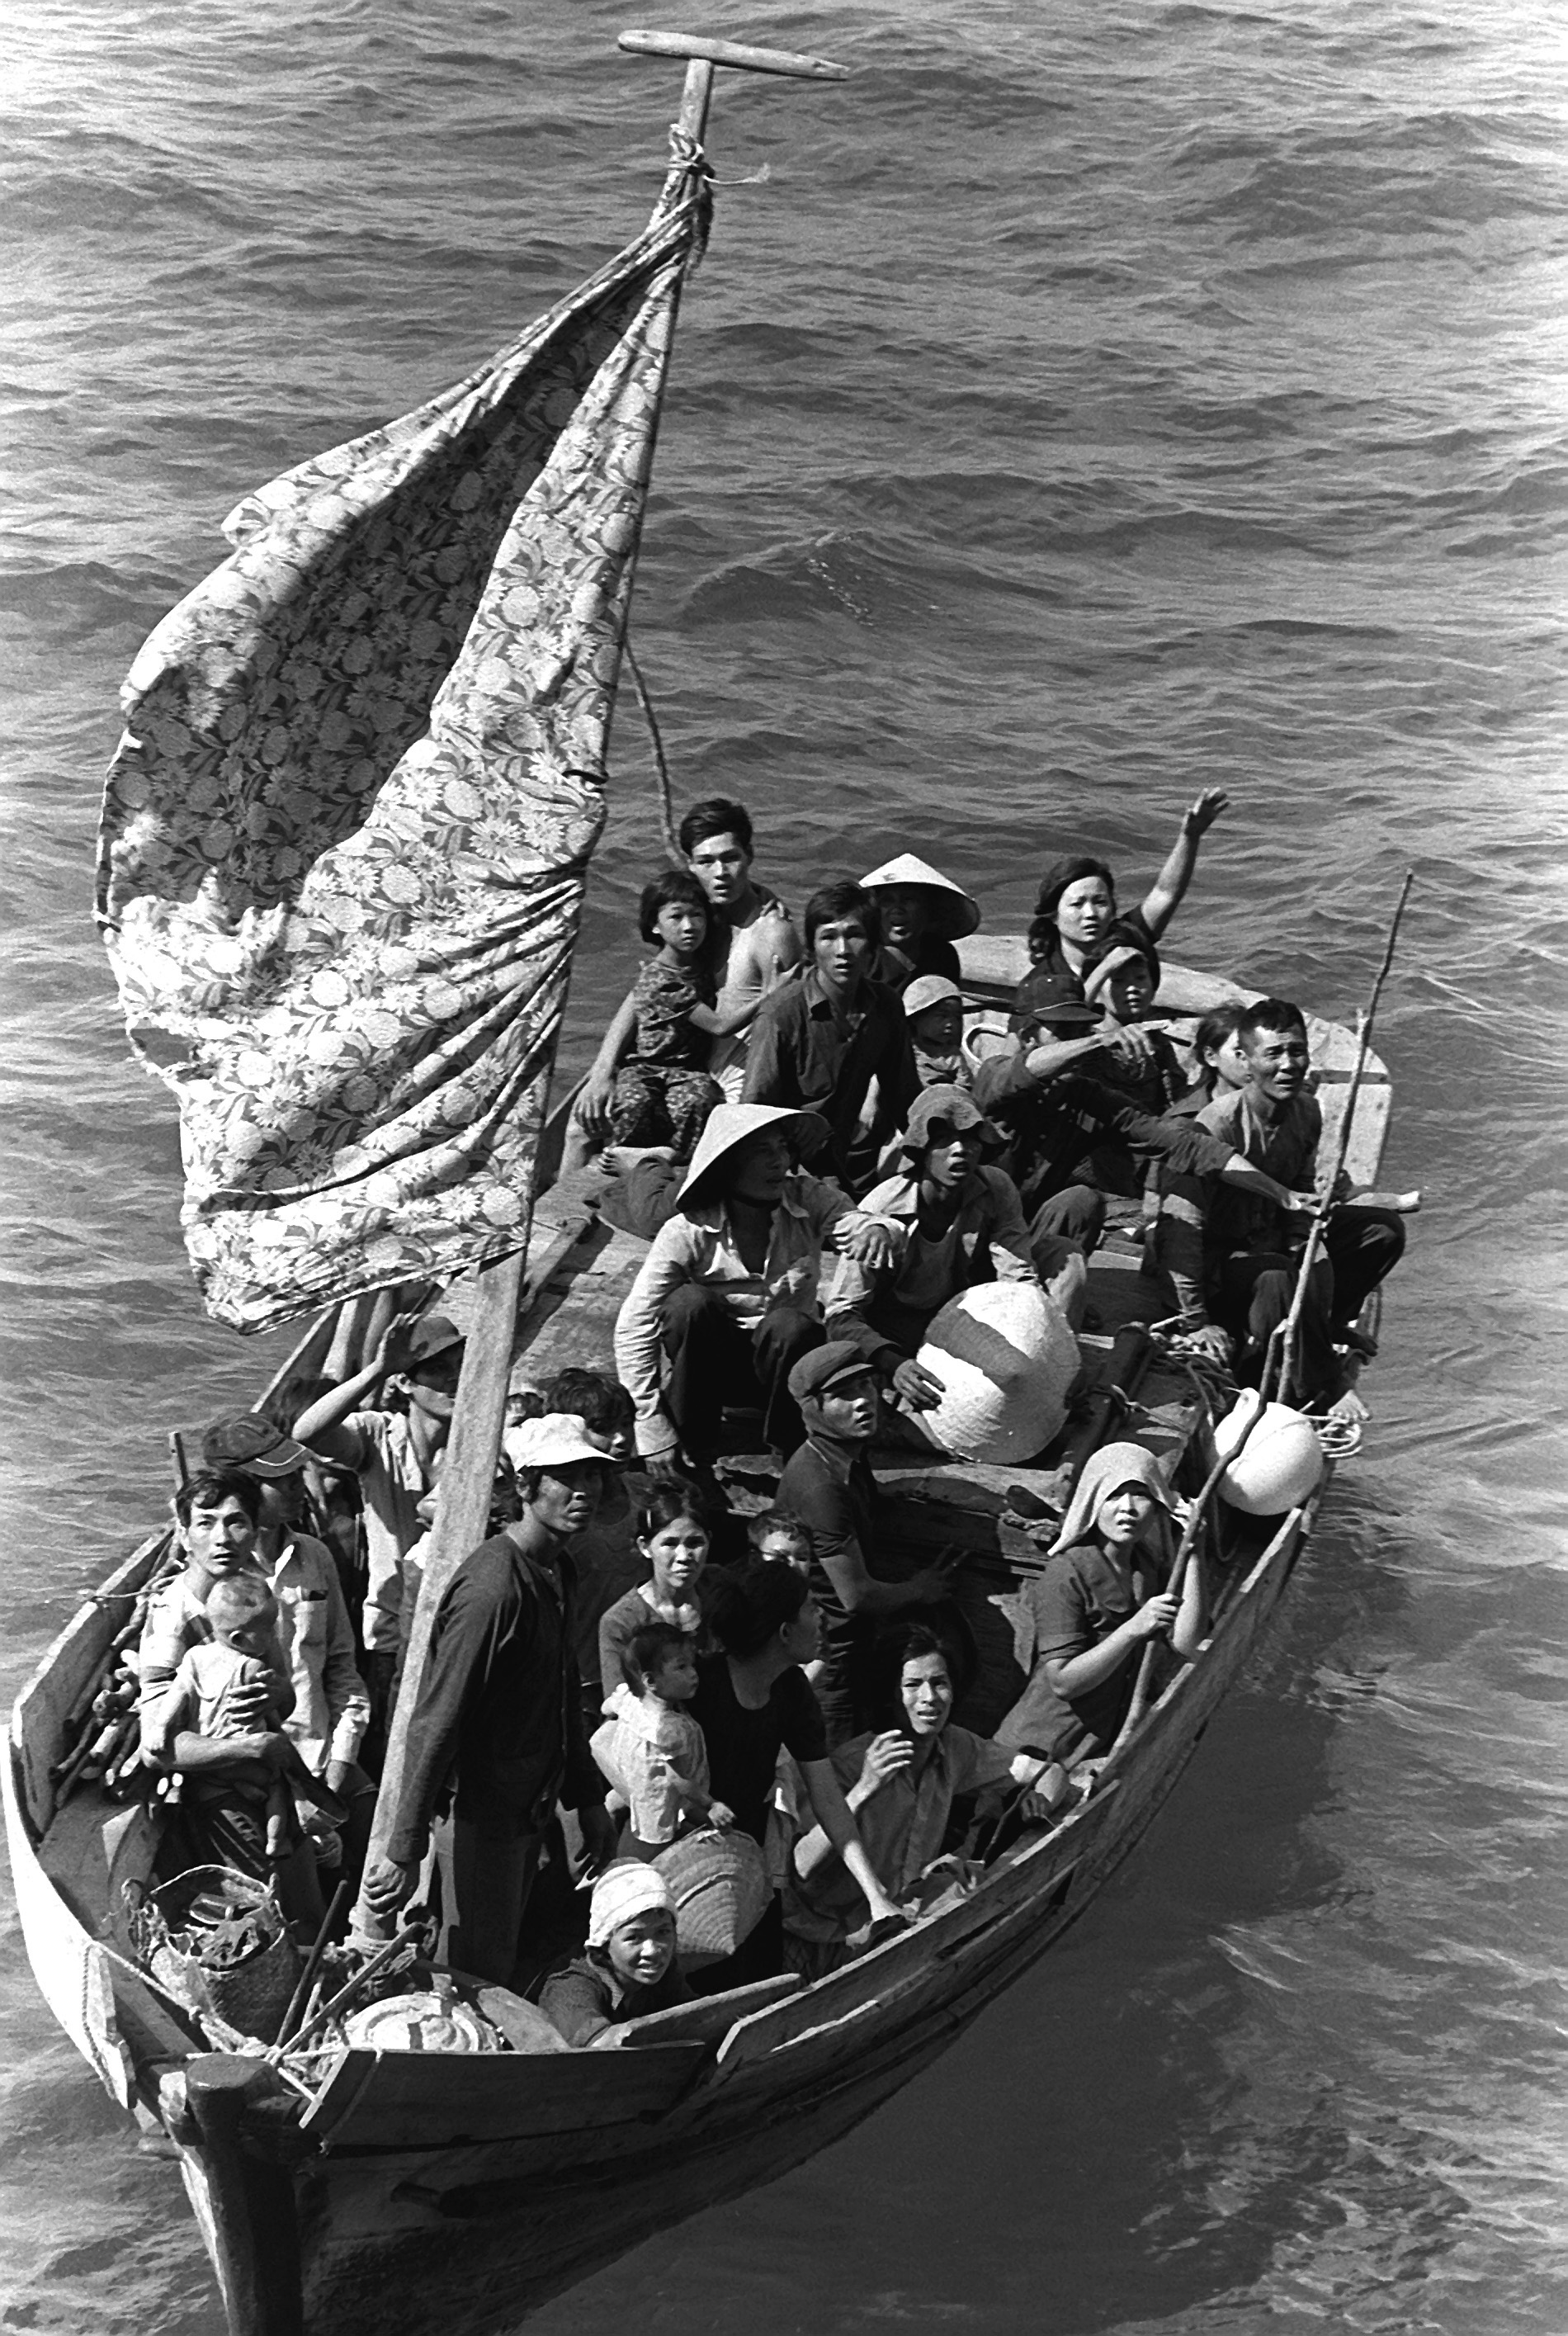 Vietnamese boat people. Wikipedia.